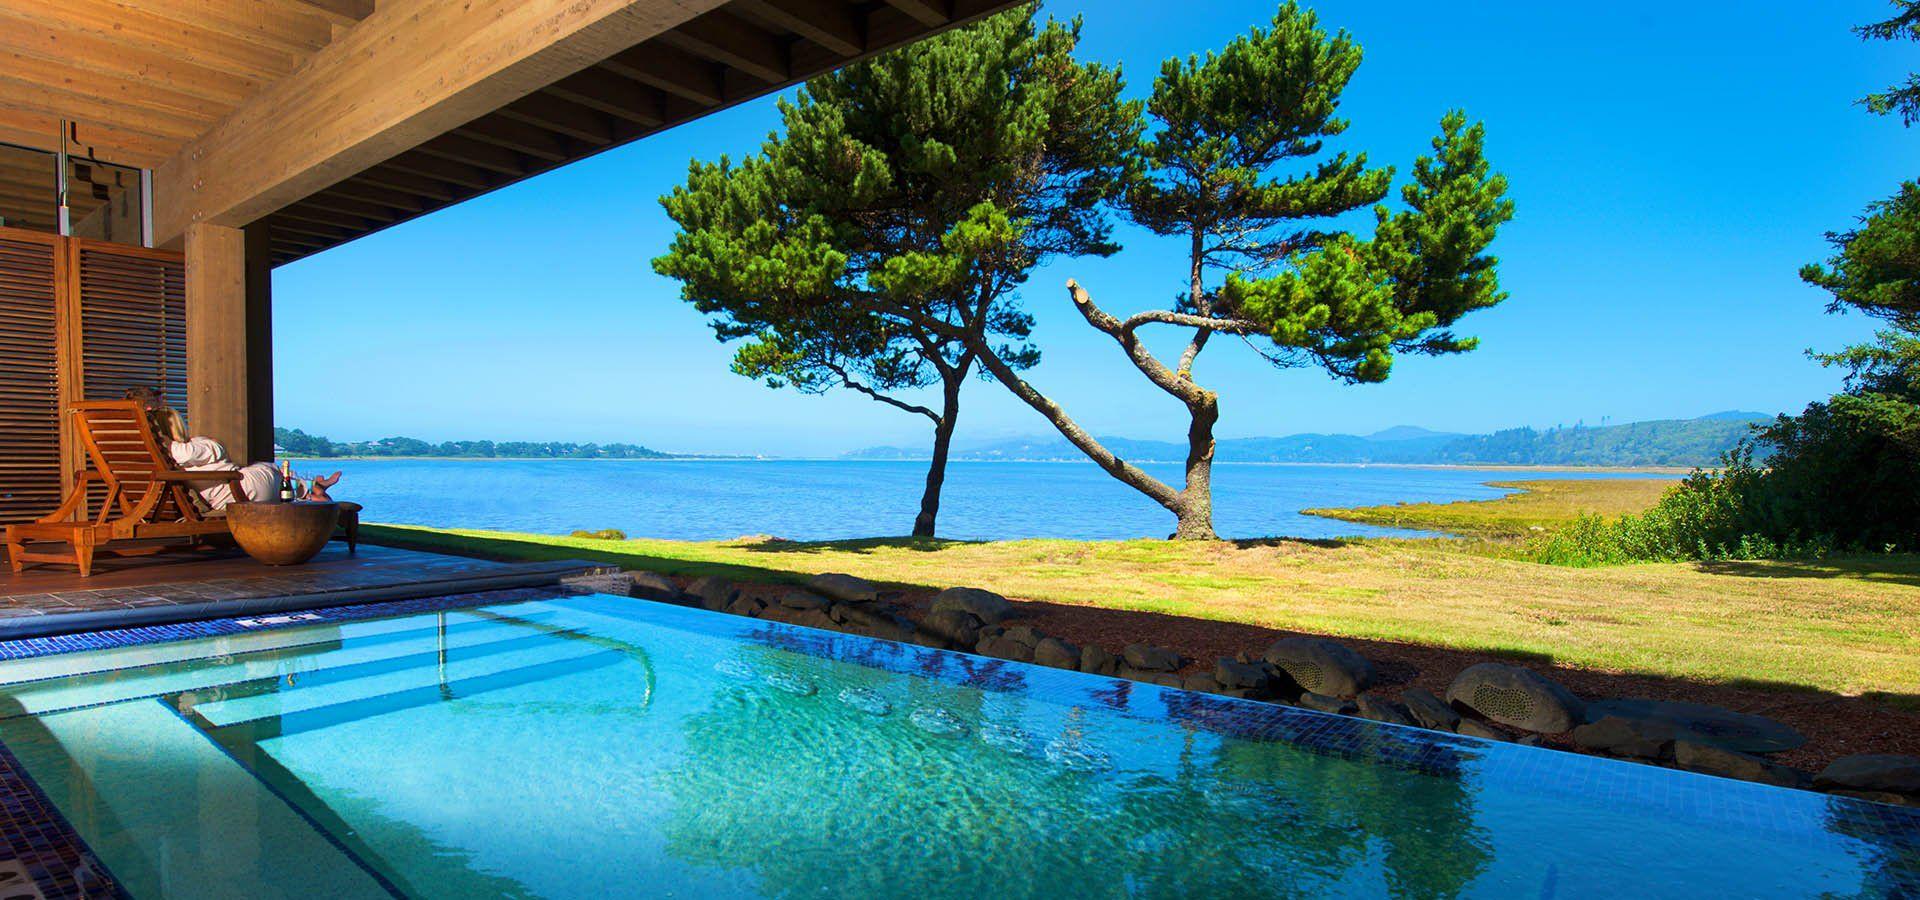 Oregon Spa Resorts Salishan Resort Best Spas In Oregon Salishan Resort Gleneden Beach Resort